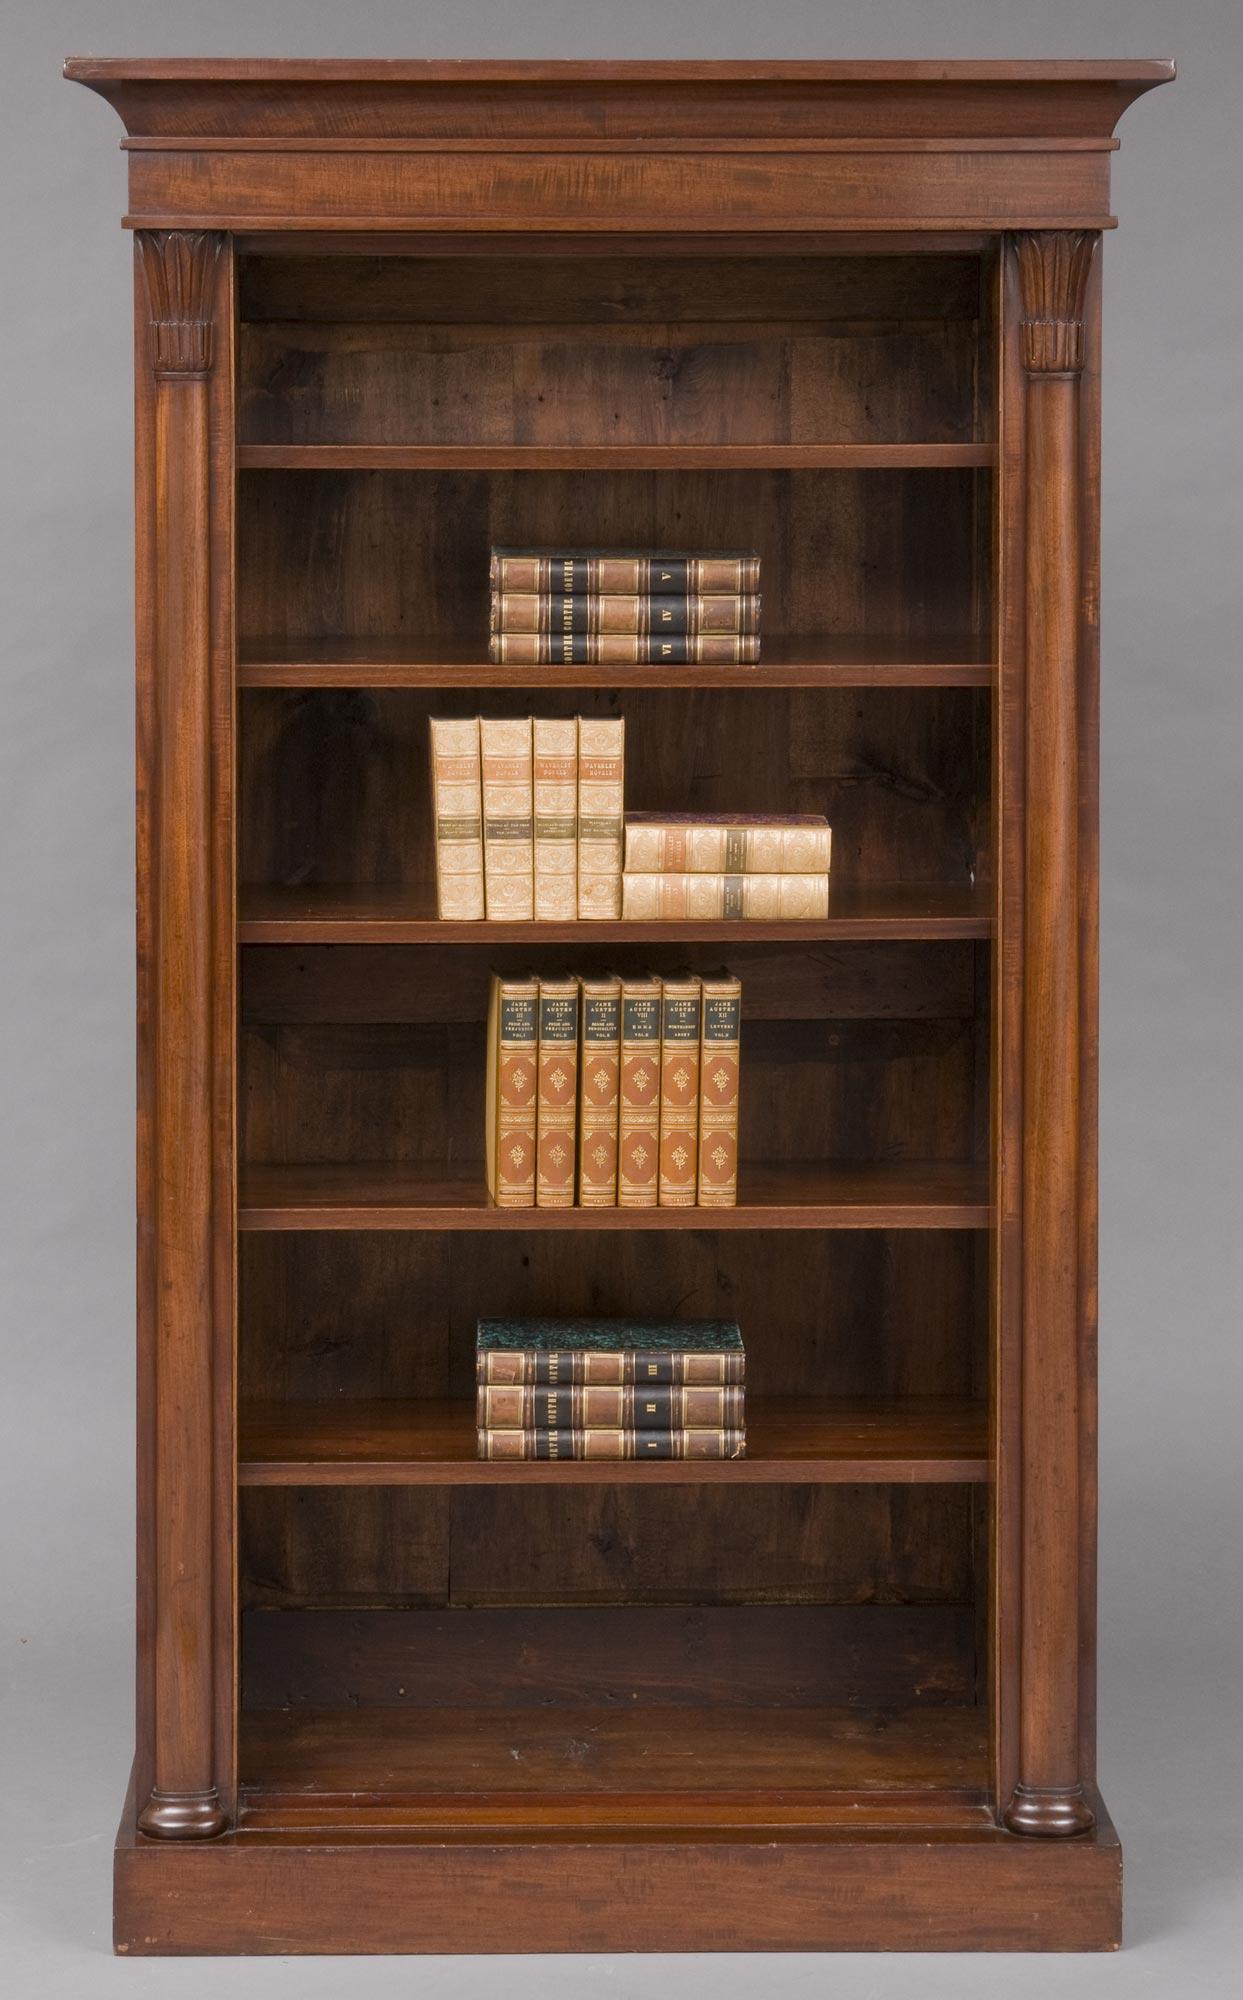 Product William Iv Open Bookcase